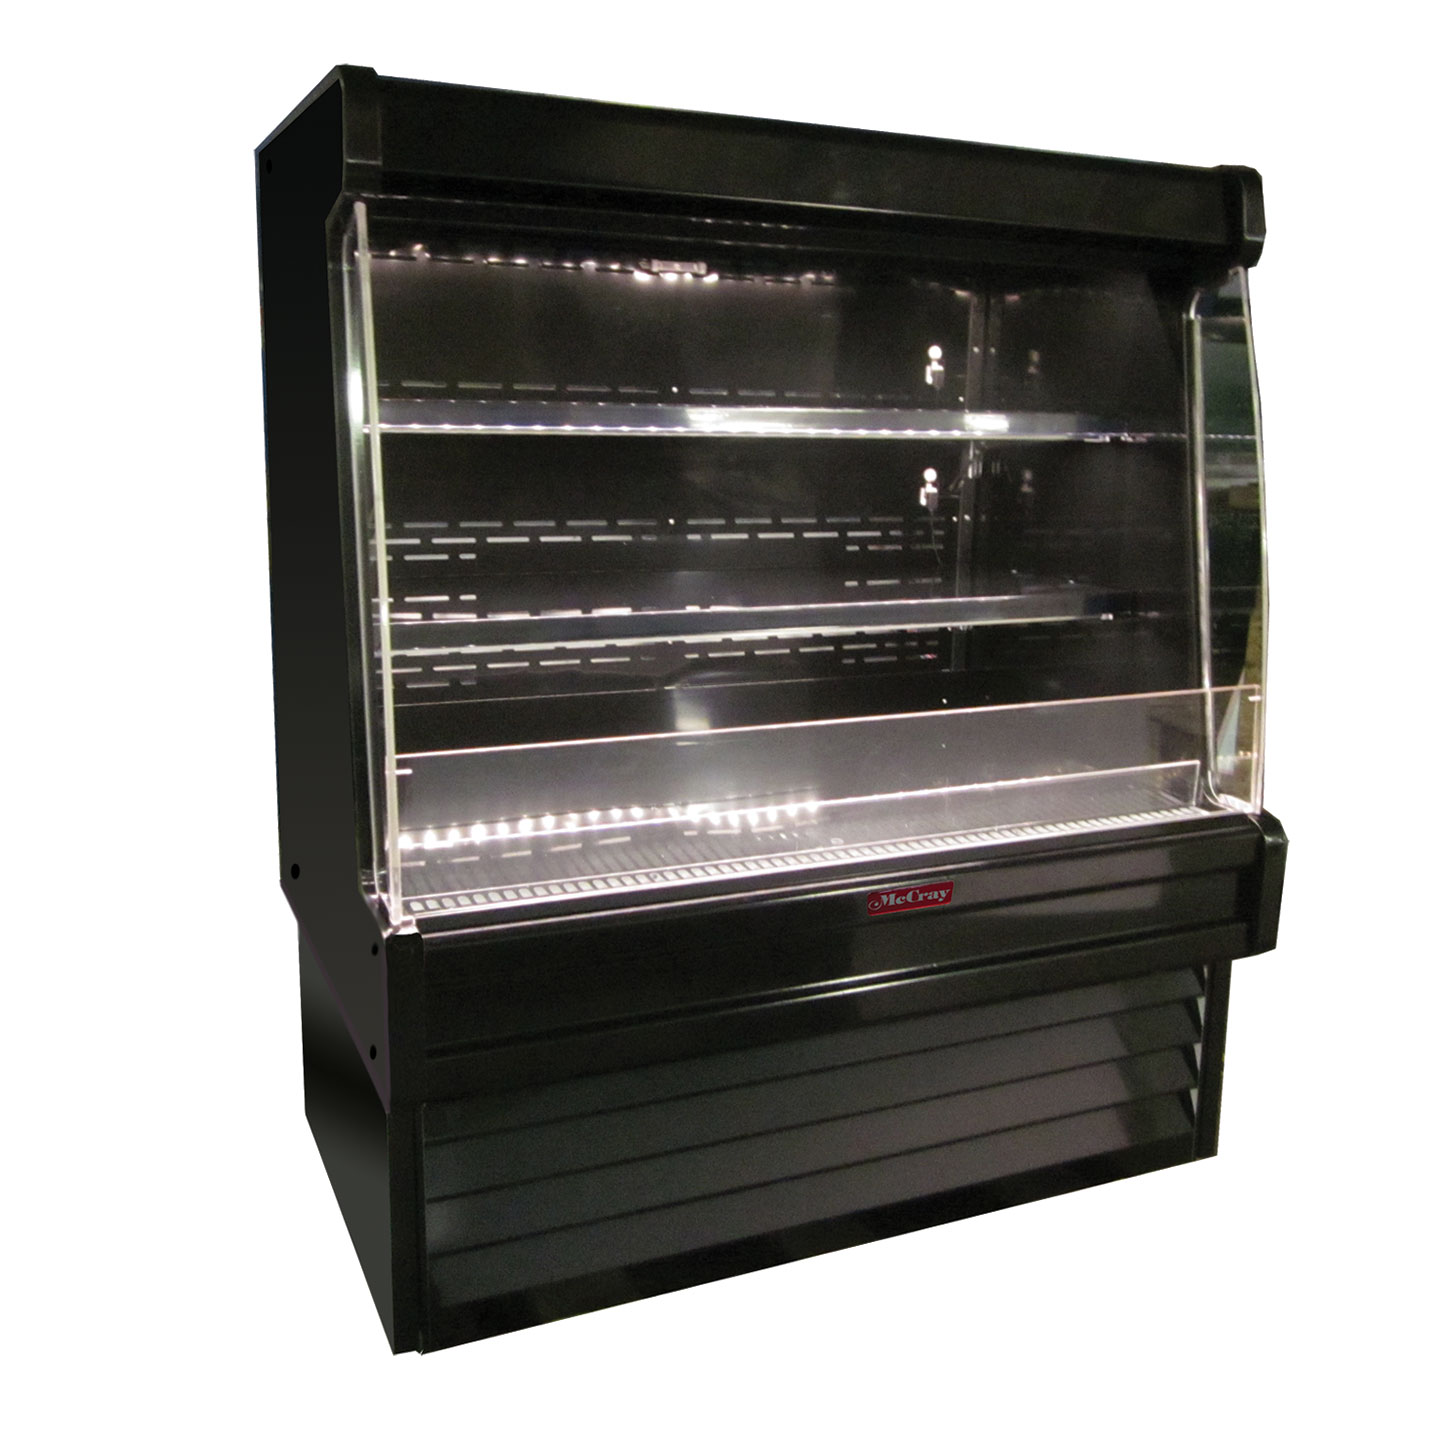 Howard-McCray R-OP35E-6L-B-LED display case, produce